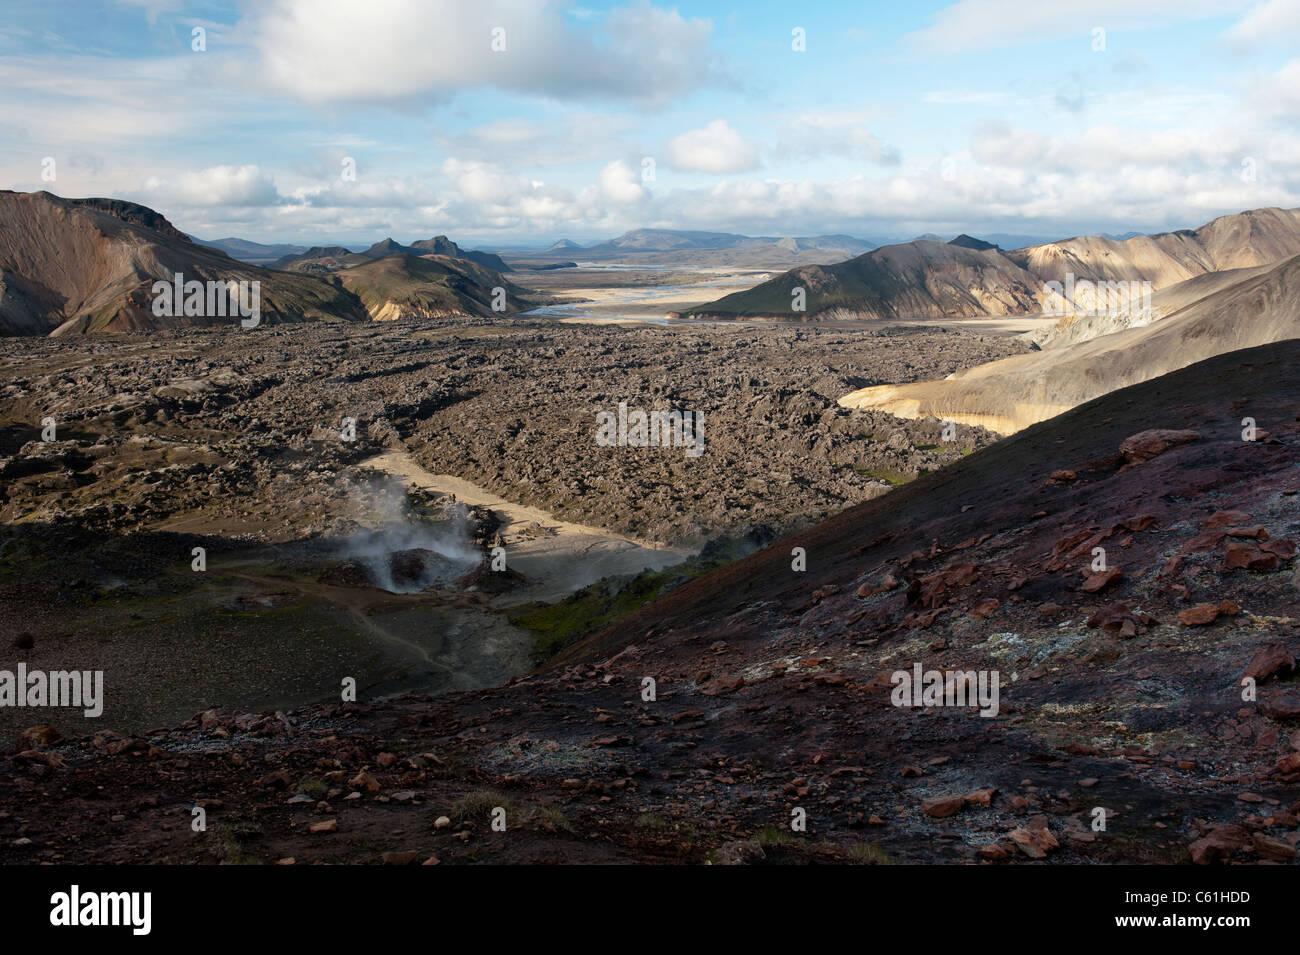 lava field at Landmannalaugar mountains, Iceland - Stock Image